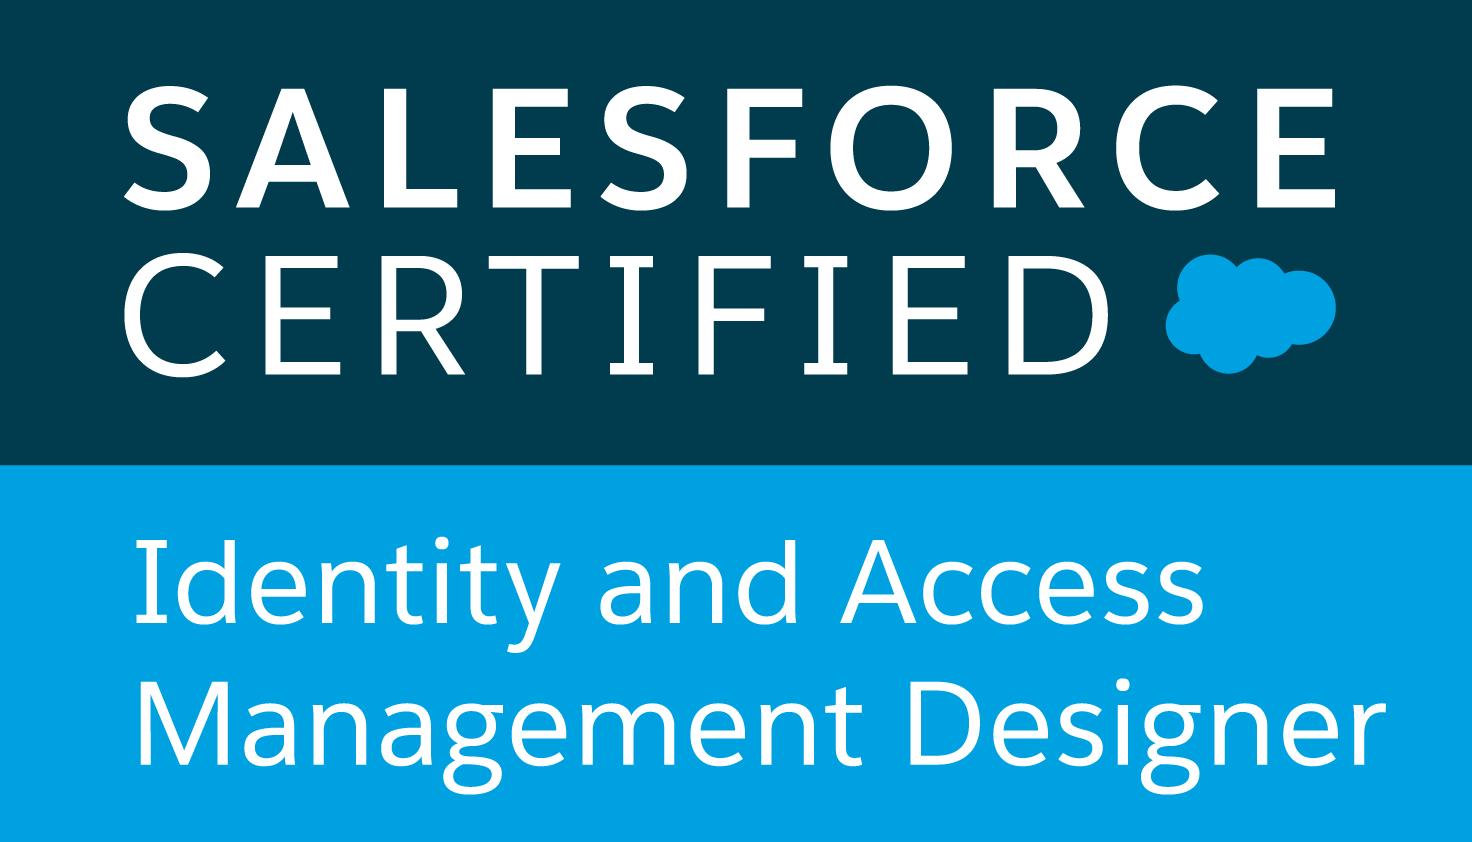 Identity and Access Management Designer